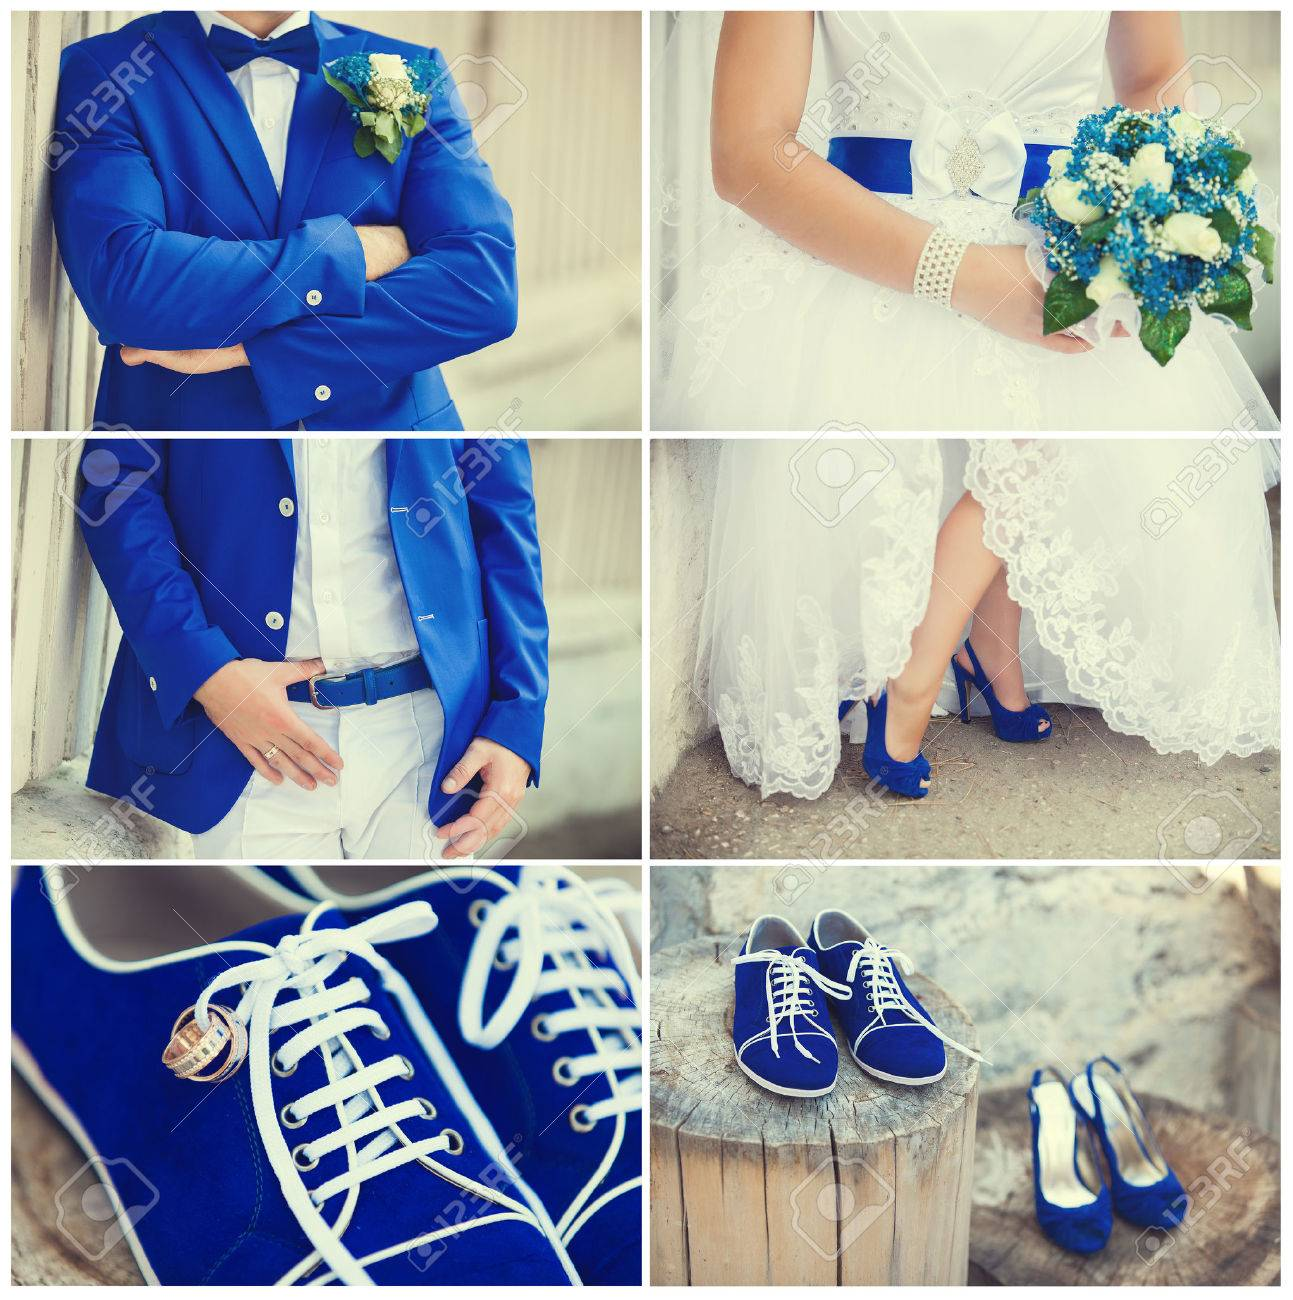 wedding theme collage with beautiful blue theme Stock Photo - 24418854